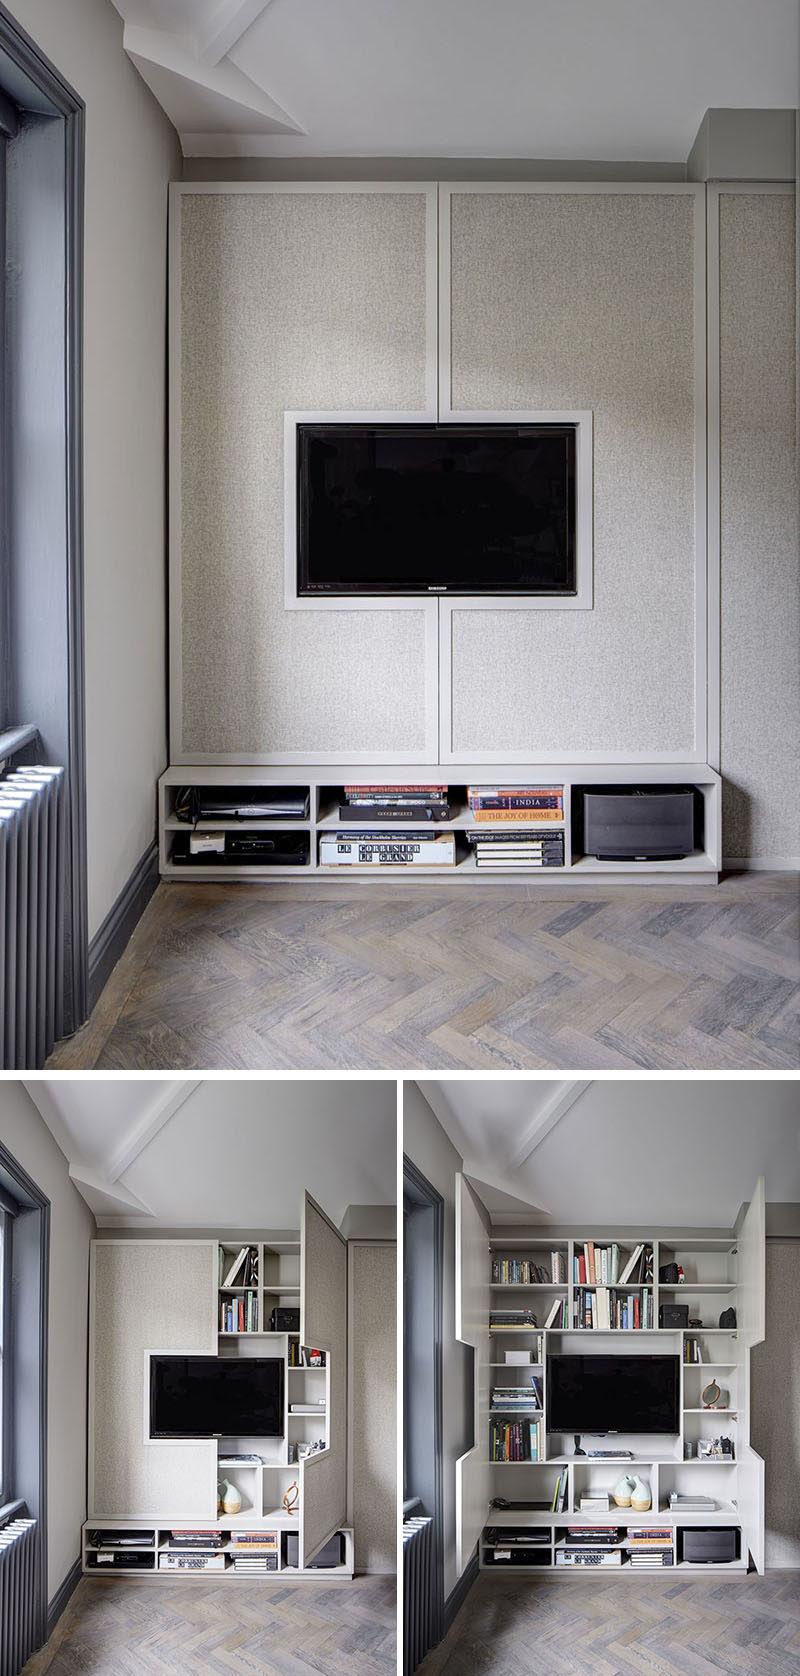 8 Tv Wall Design Ideas For Your Living Room Contemporist